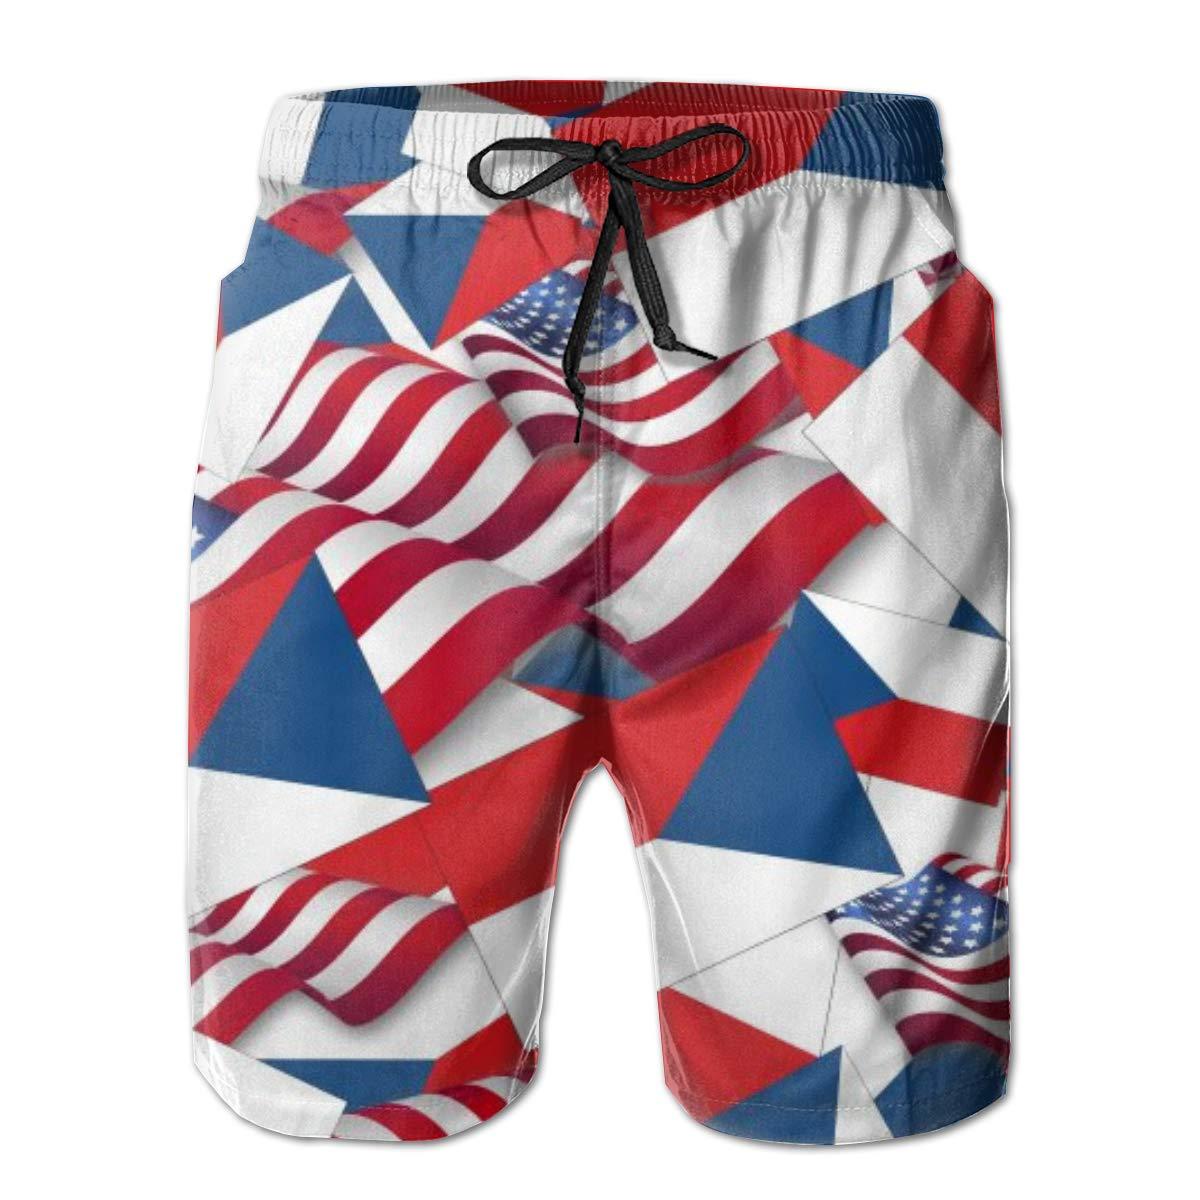 FUNSTYEET Czech Republic Flag with America Flag Mens Board Shorts Swim Mesh Lining and Side Pocket